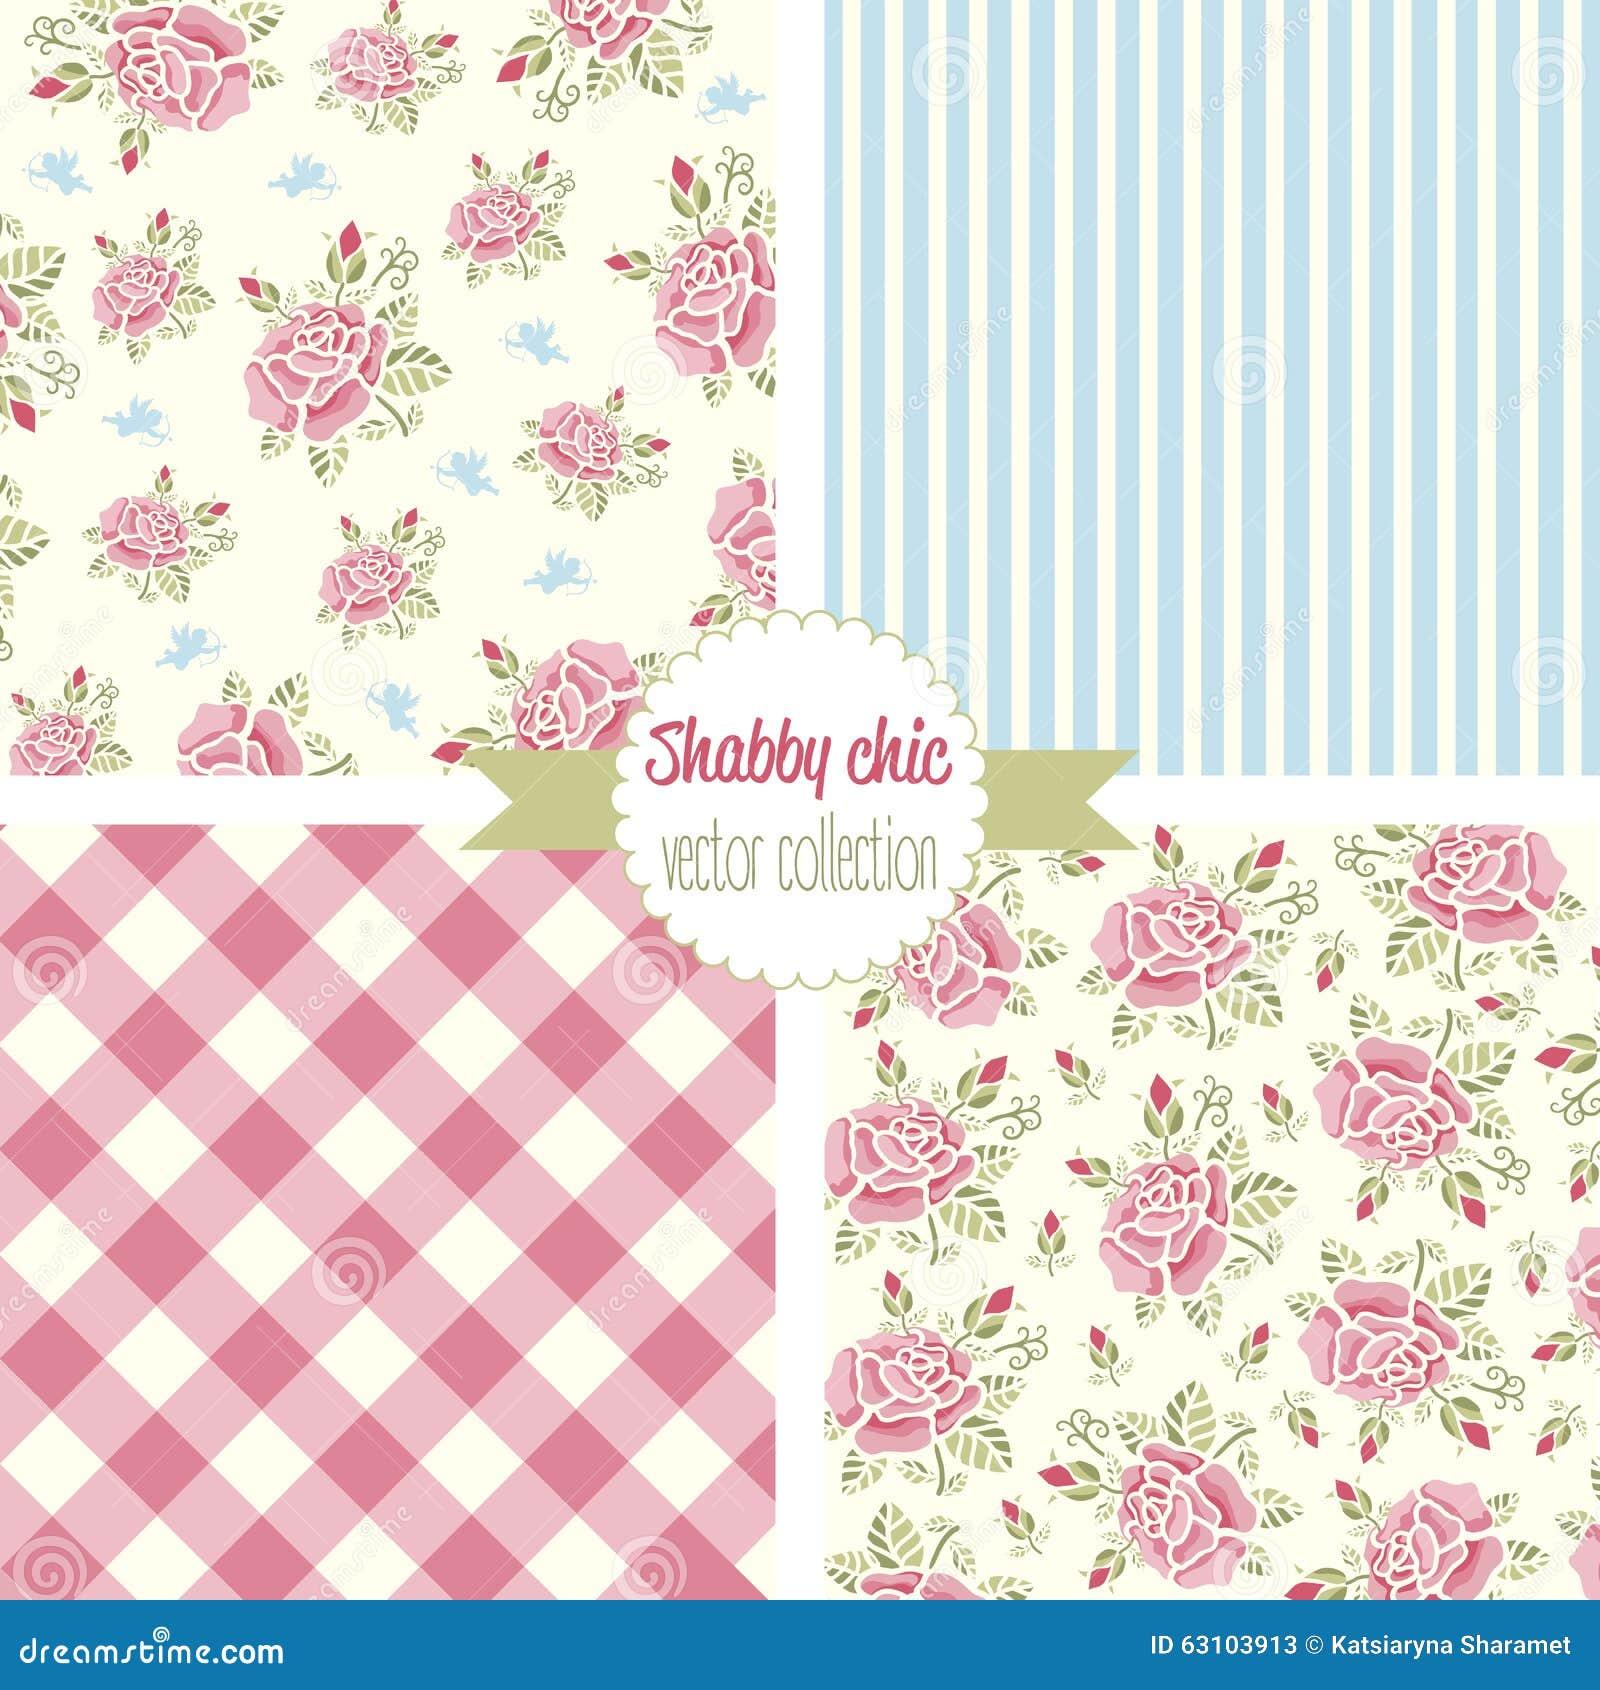 Shabby Chic Rose Patterns Set Seamless Pattern Vintage